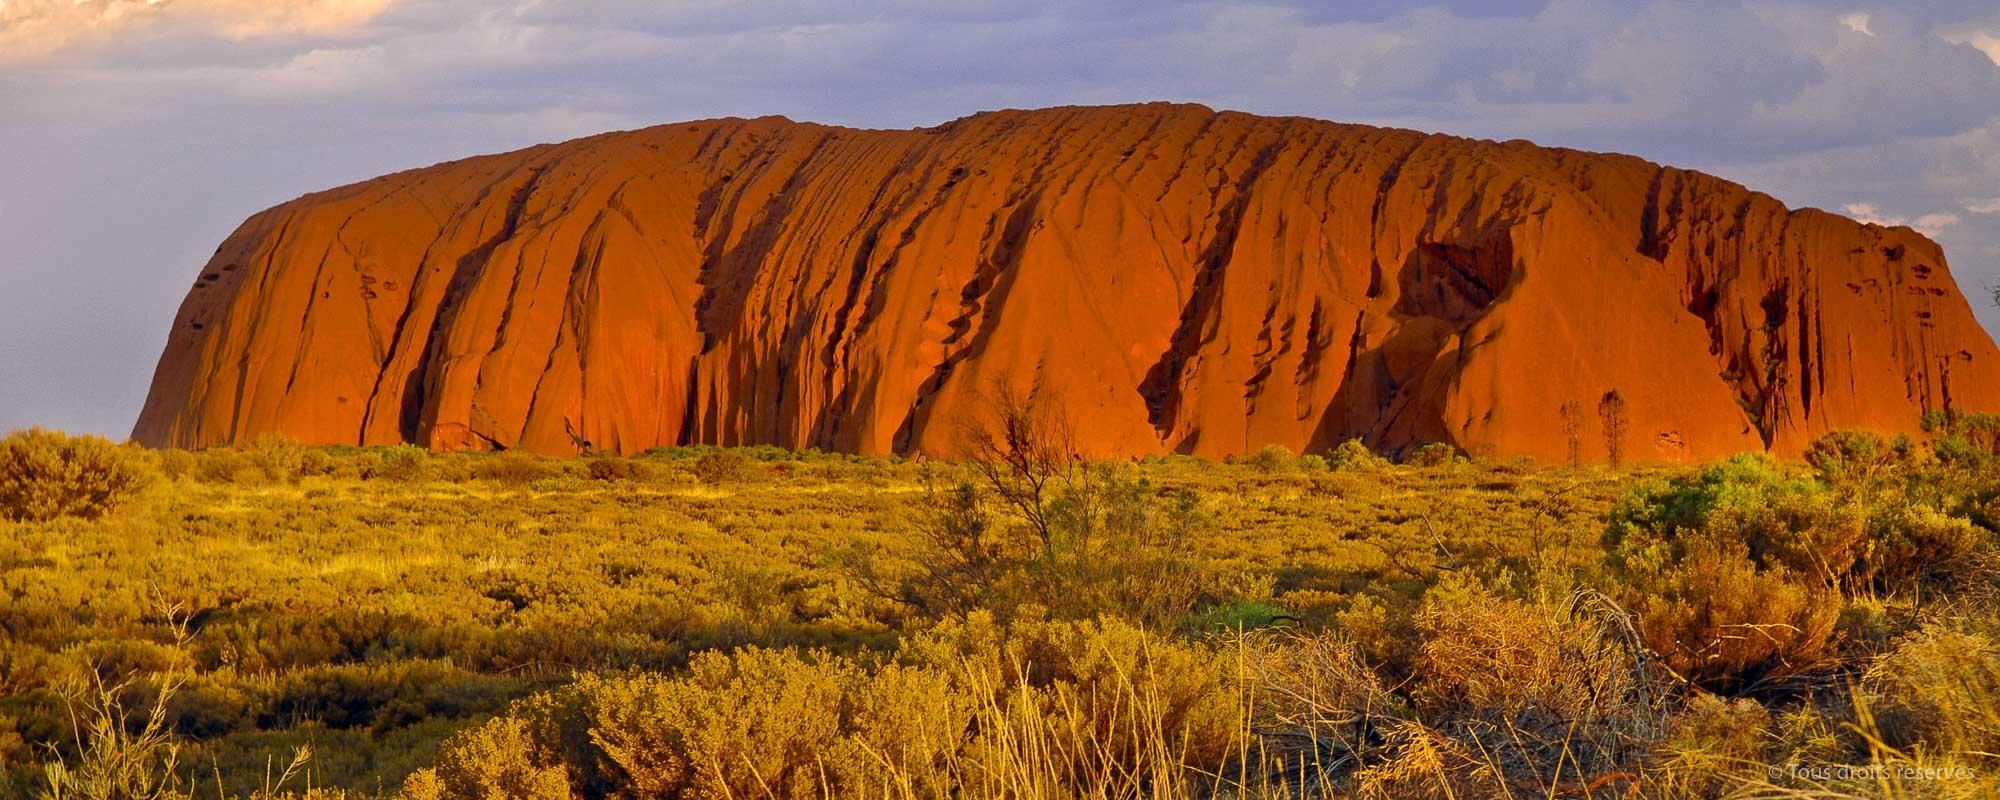 Grande belle rencontre Australie